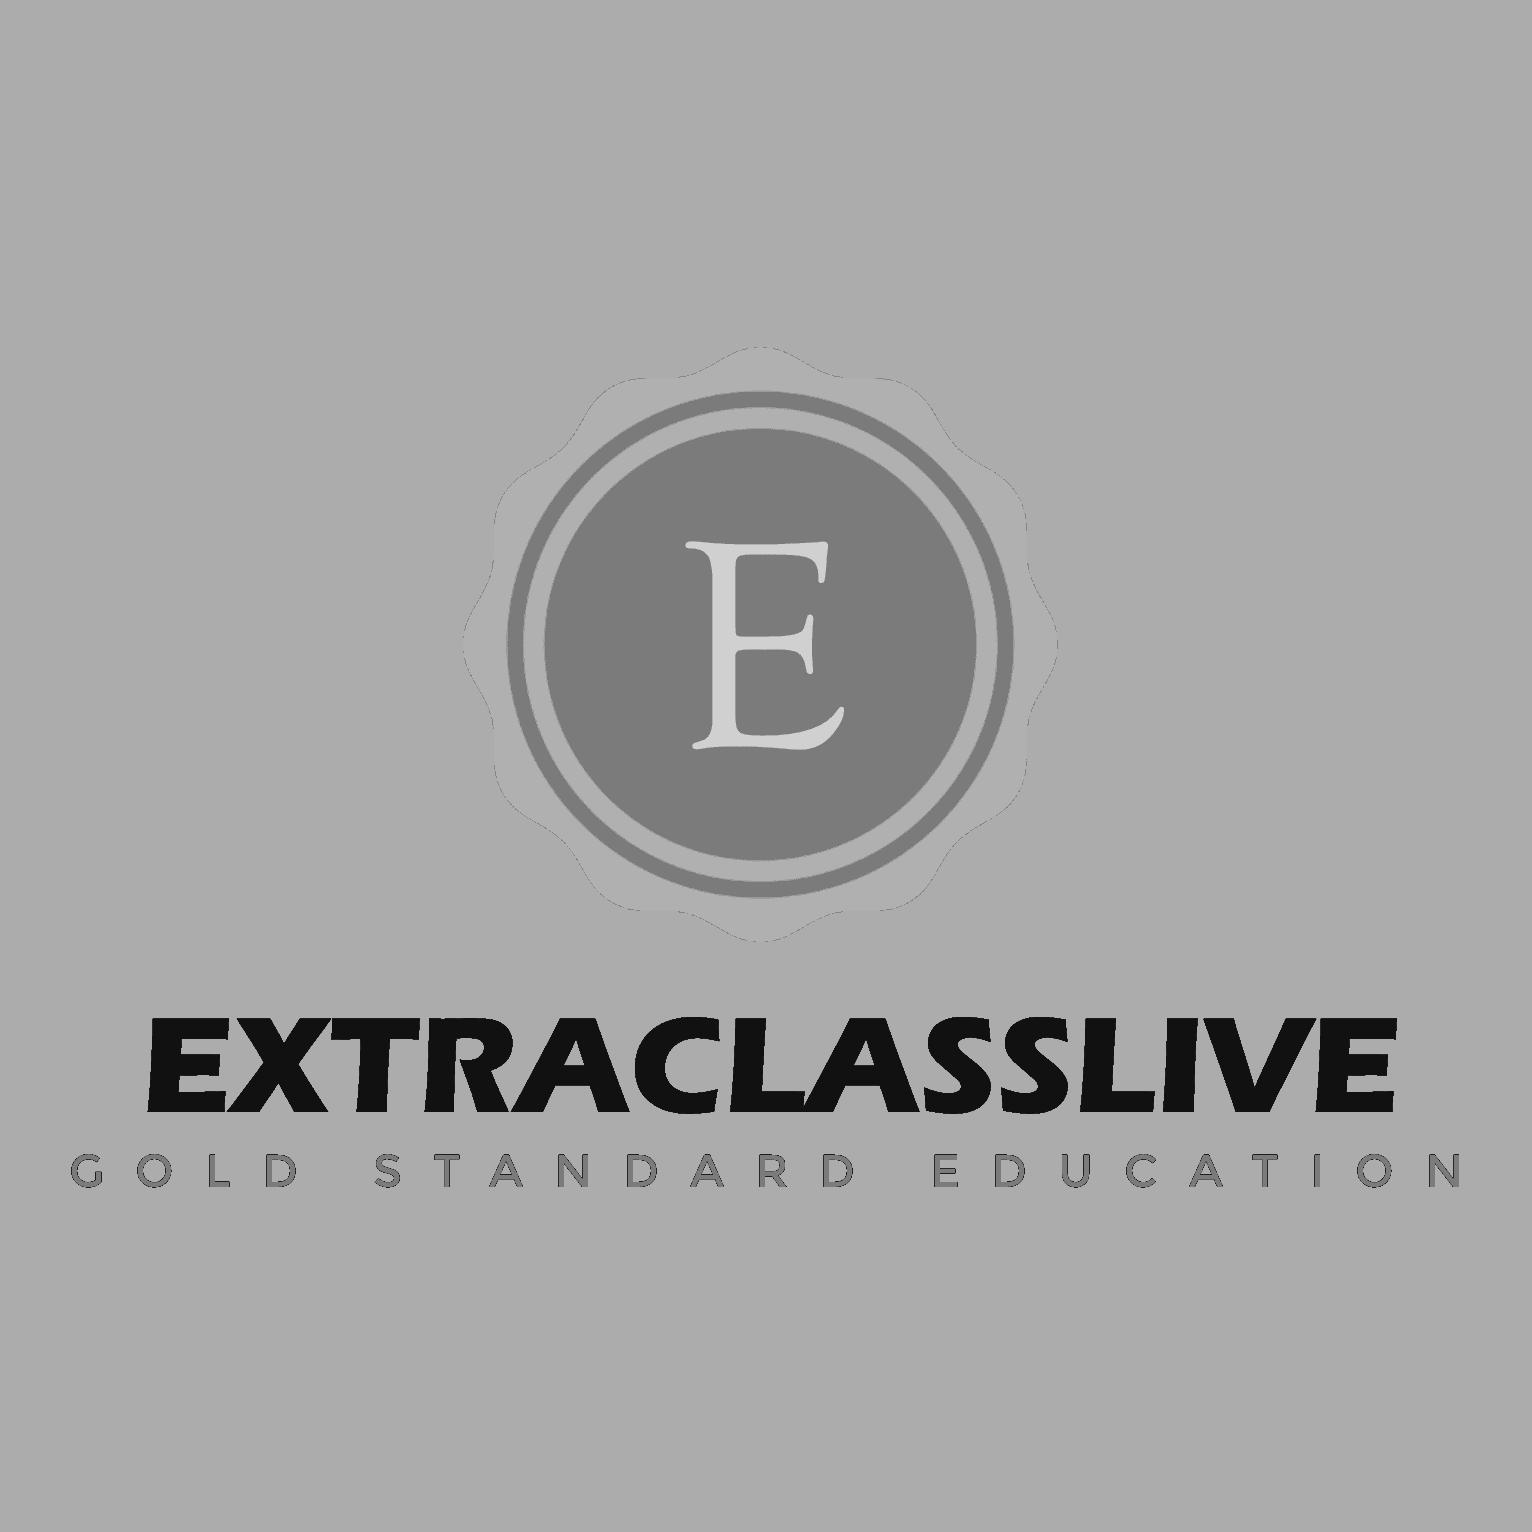 extraclasslive partner image